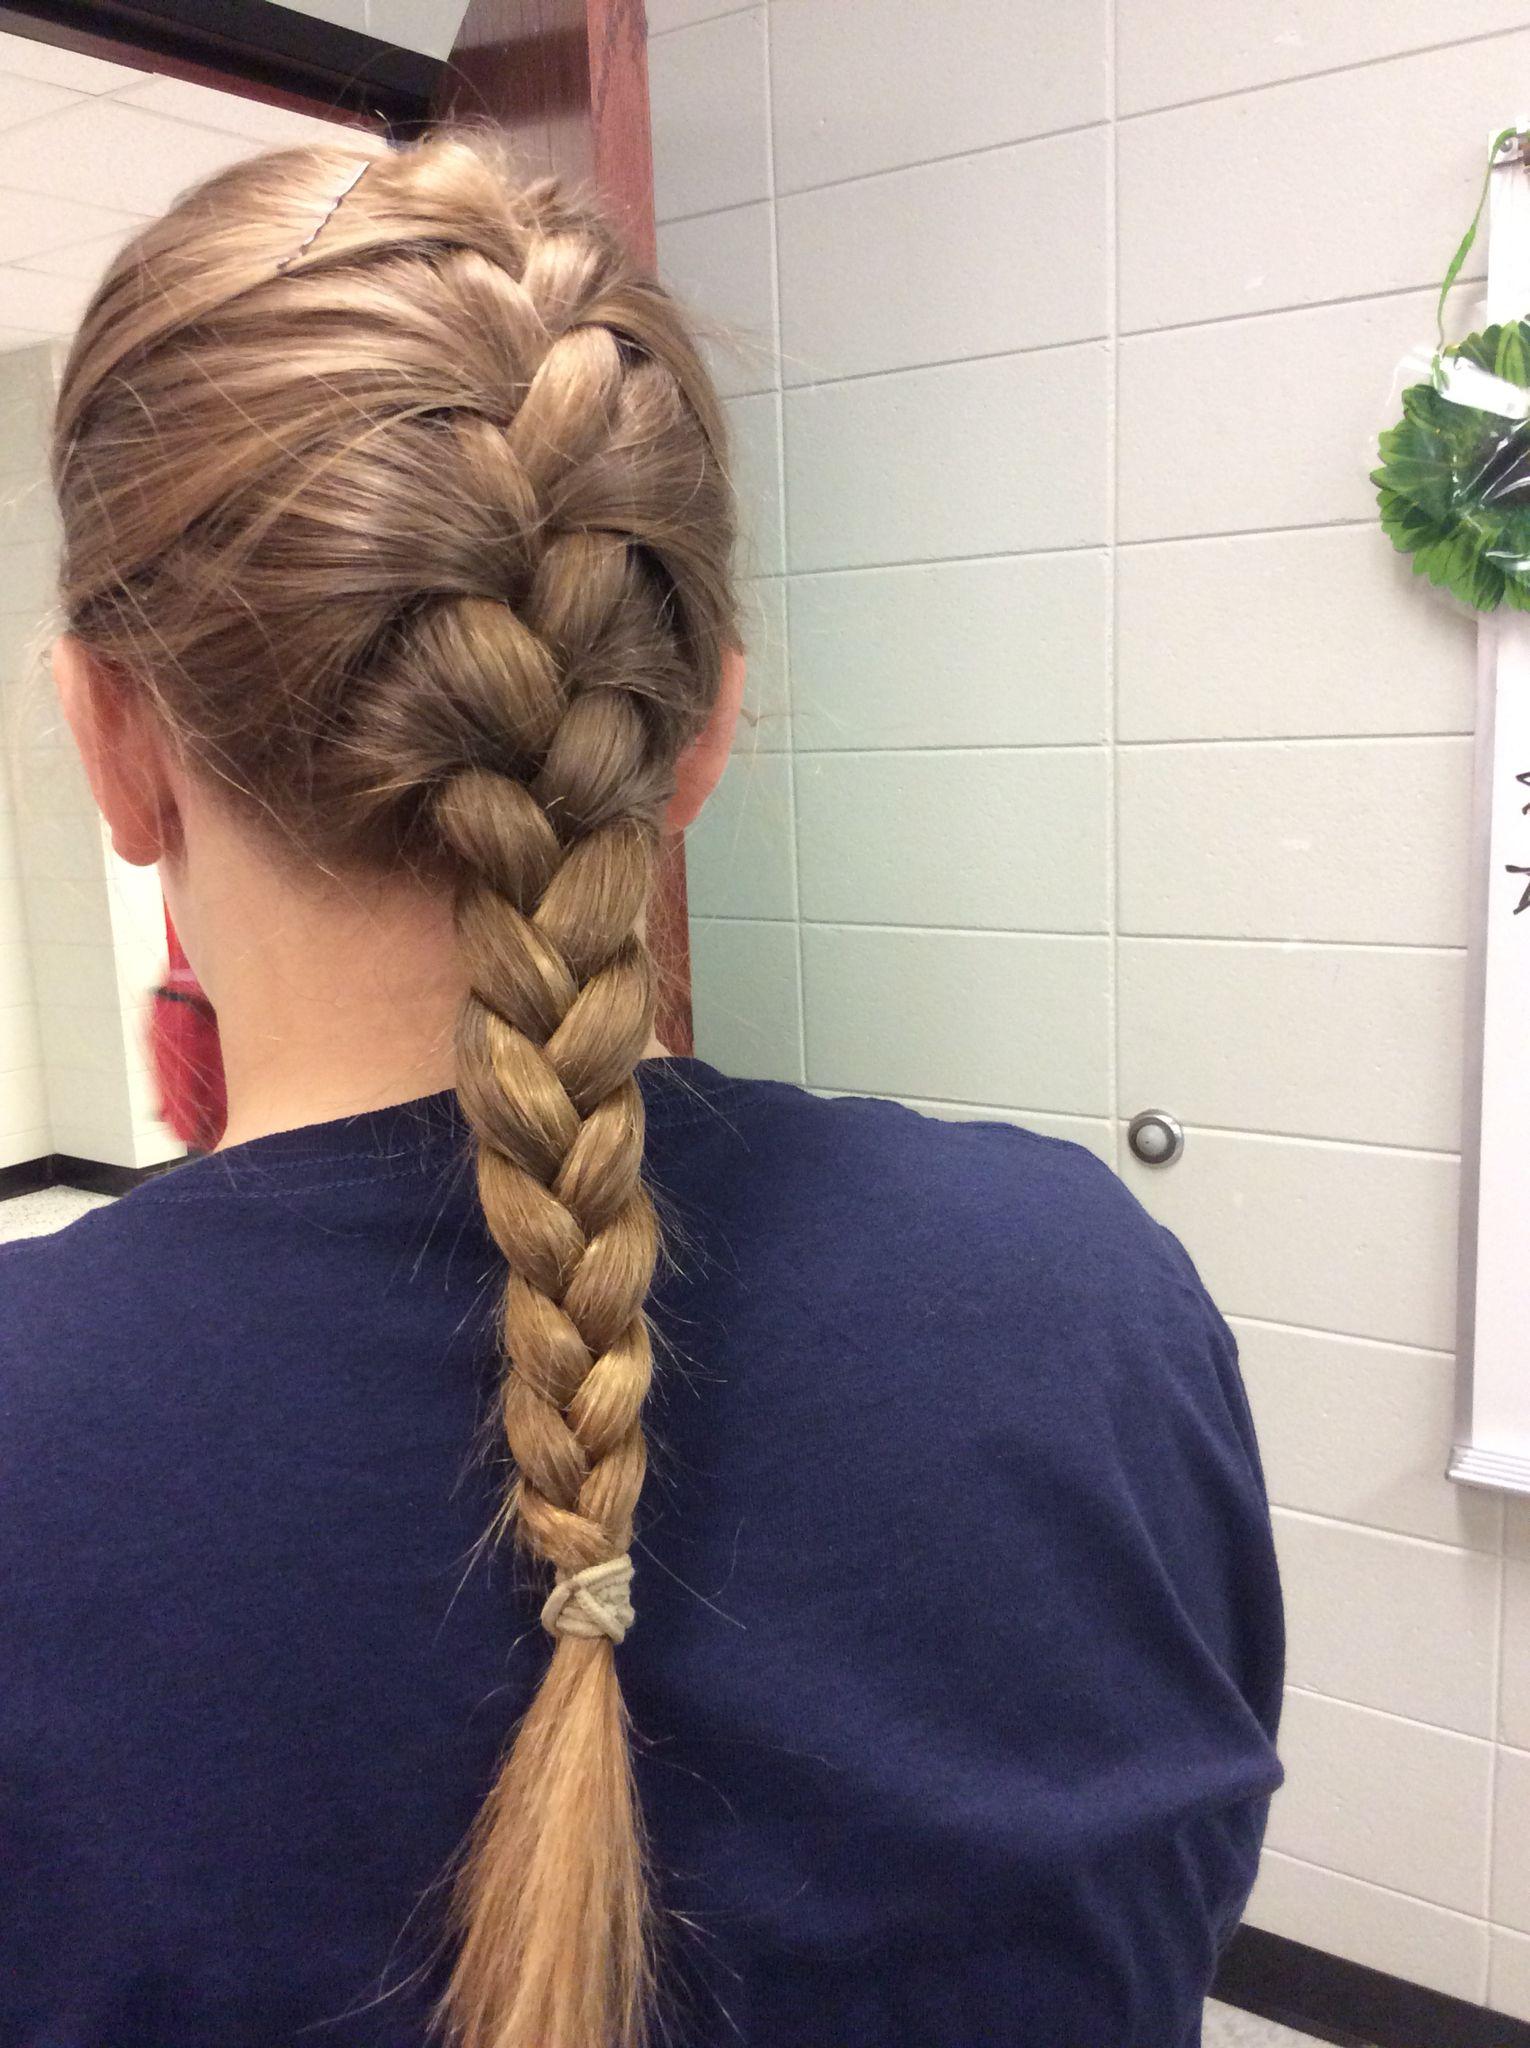 a simple french braid ✌️🌺 | braids in 2019 | braided